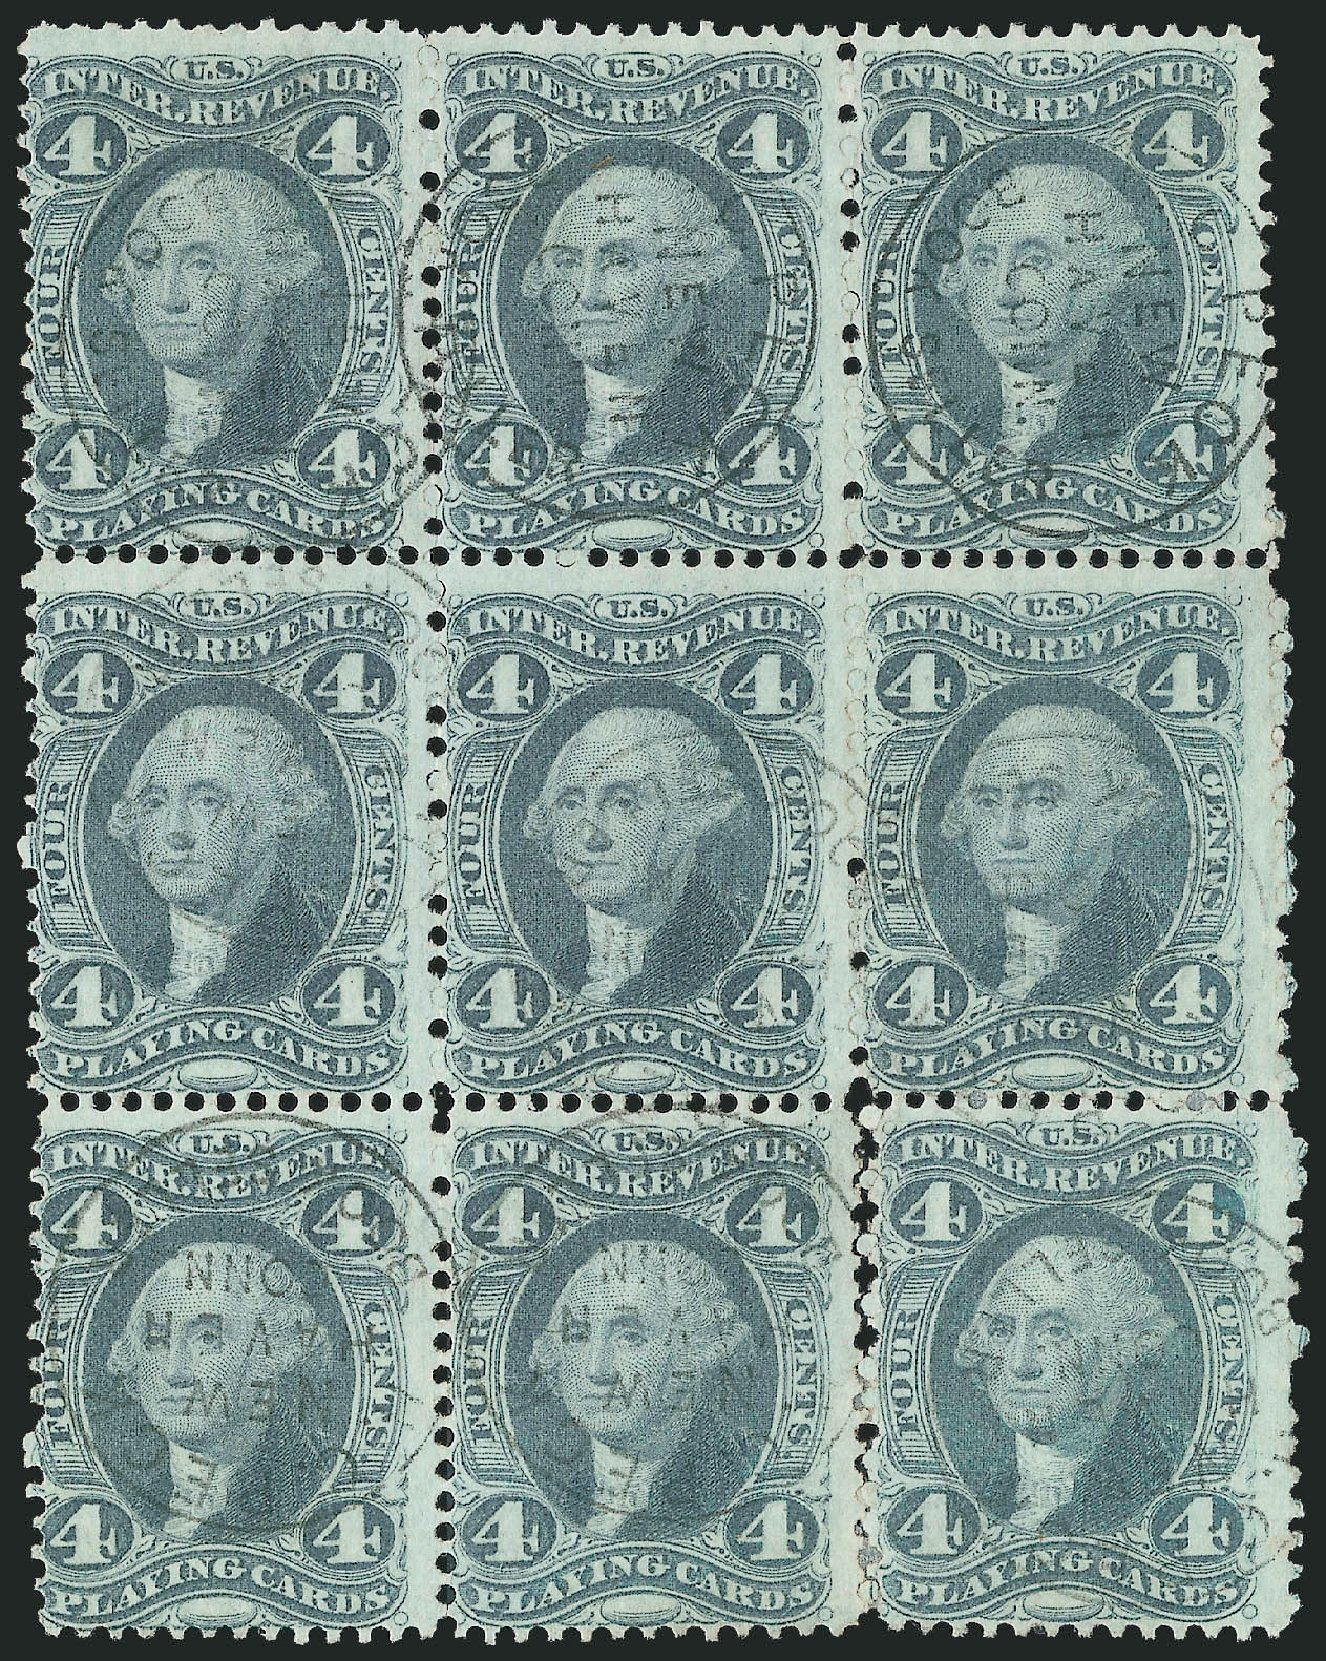 Cost of US Stamps Scott Cat. #R21 - 1863 4c Revenue Playing Cards. Robert Siegel Auction Galleries, Dec 2014, Sale 1089, Lot 424